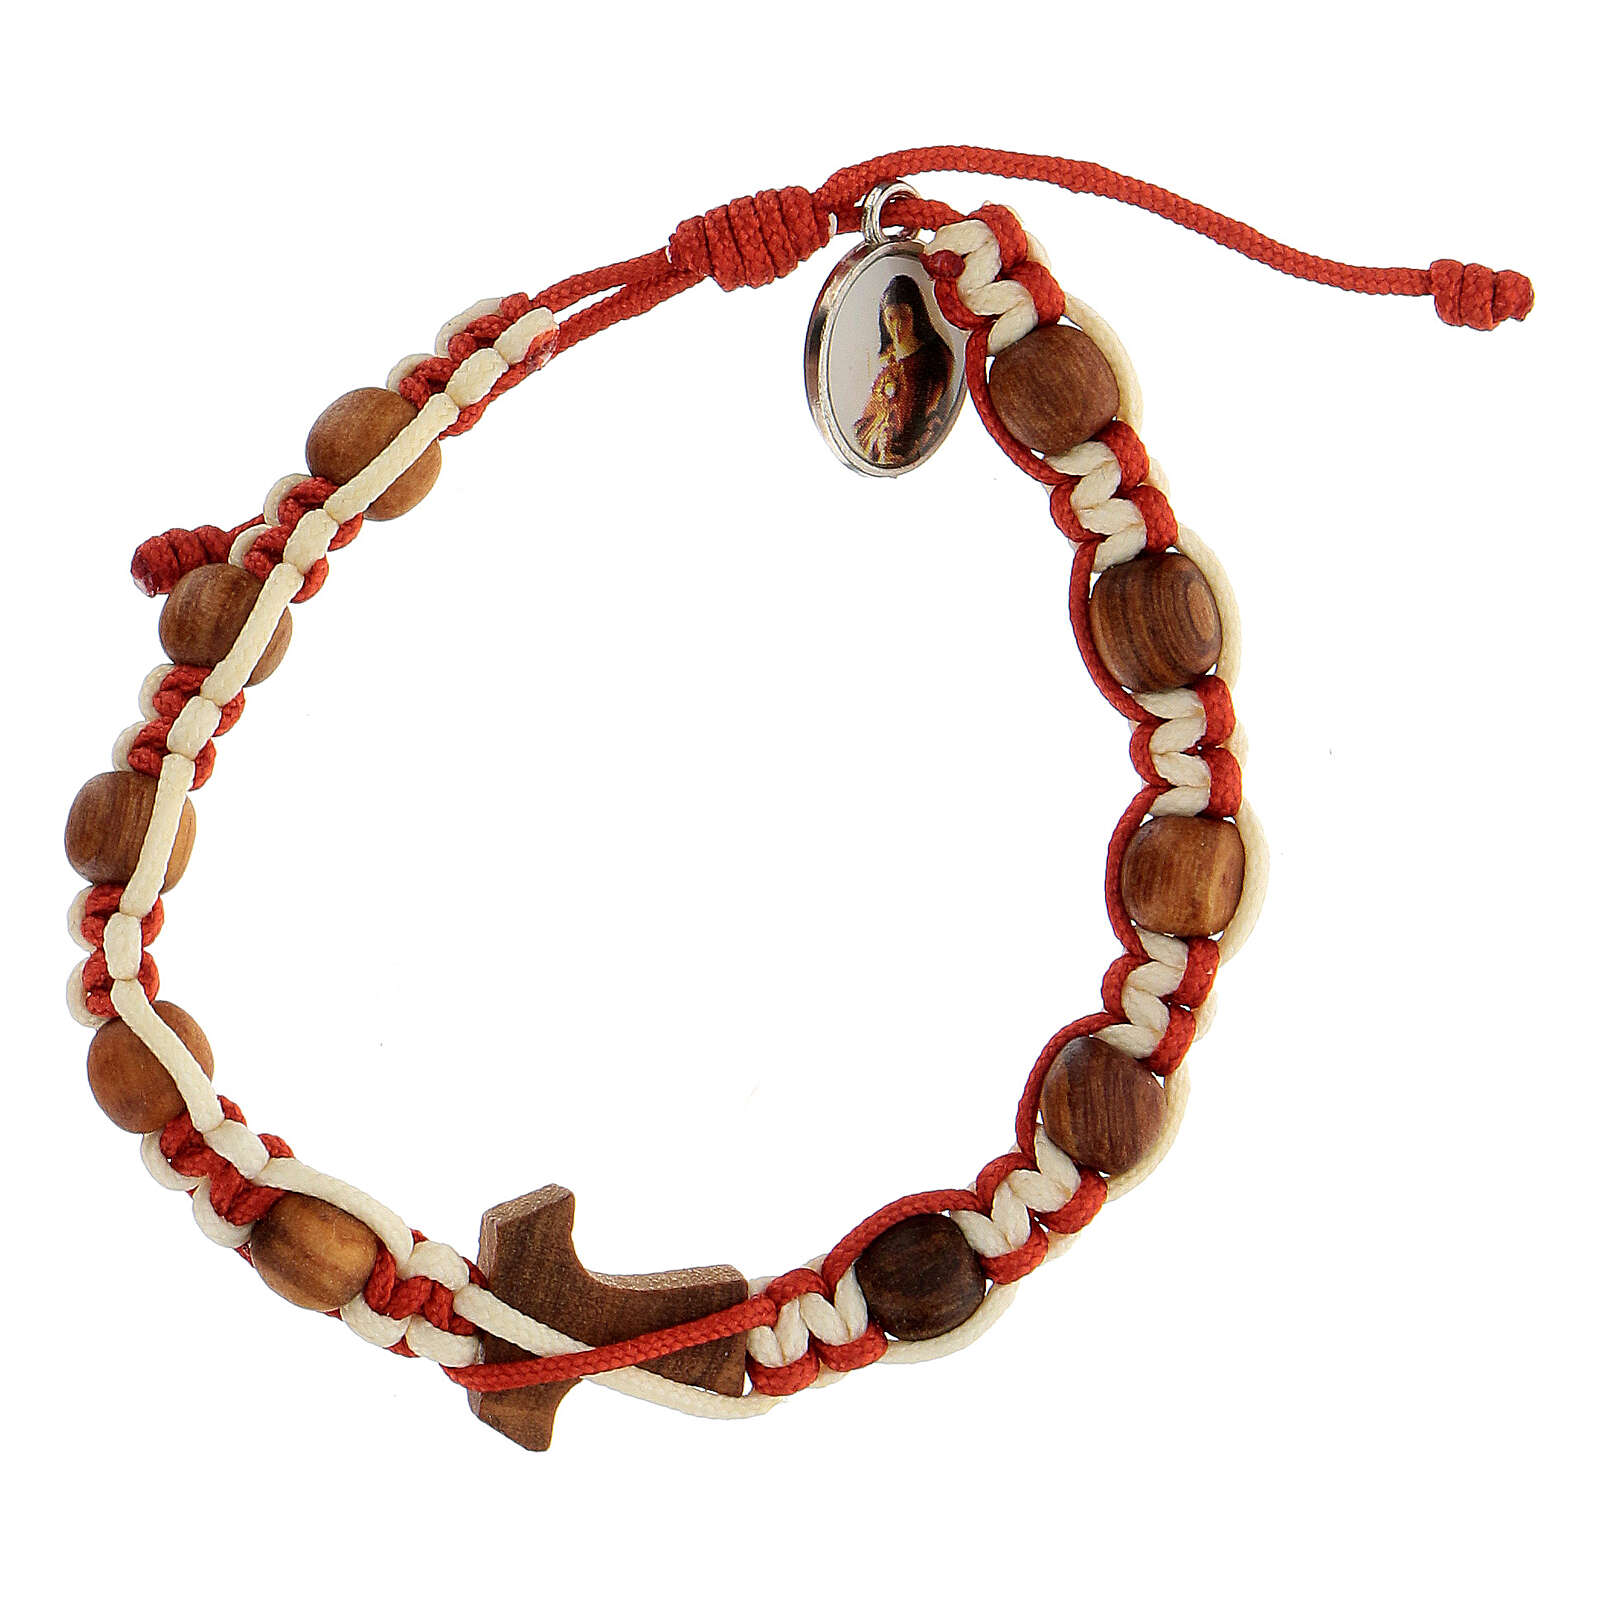 Bracelet Medjugorje enfant croix tau corde bicolore blanc et rouge 4